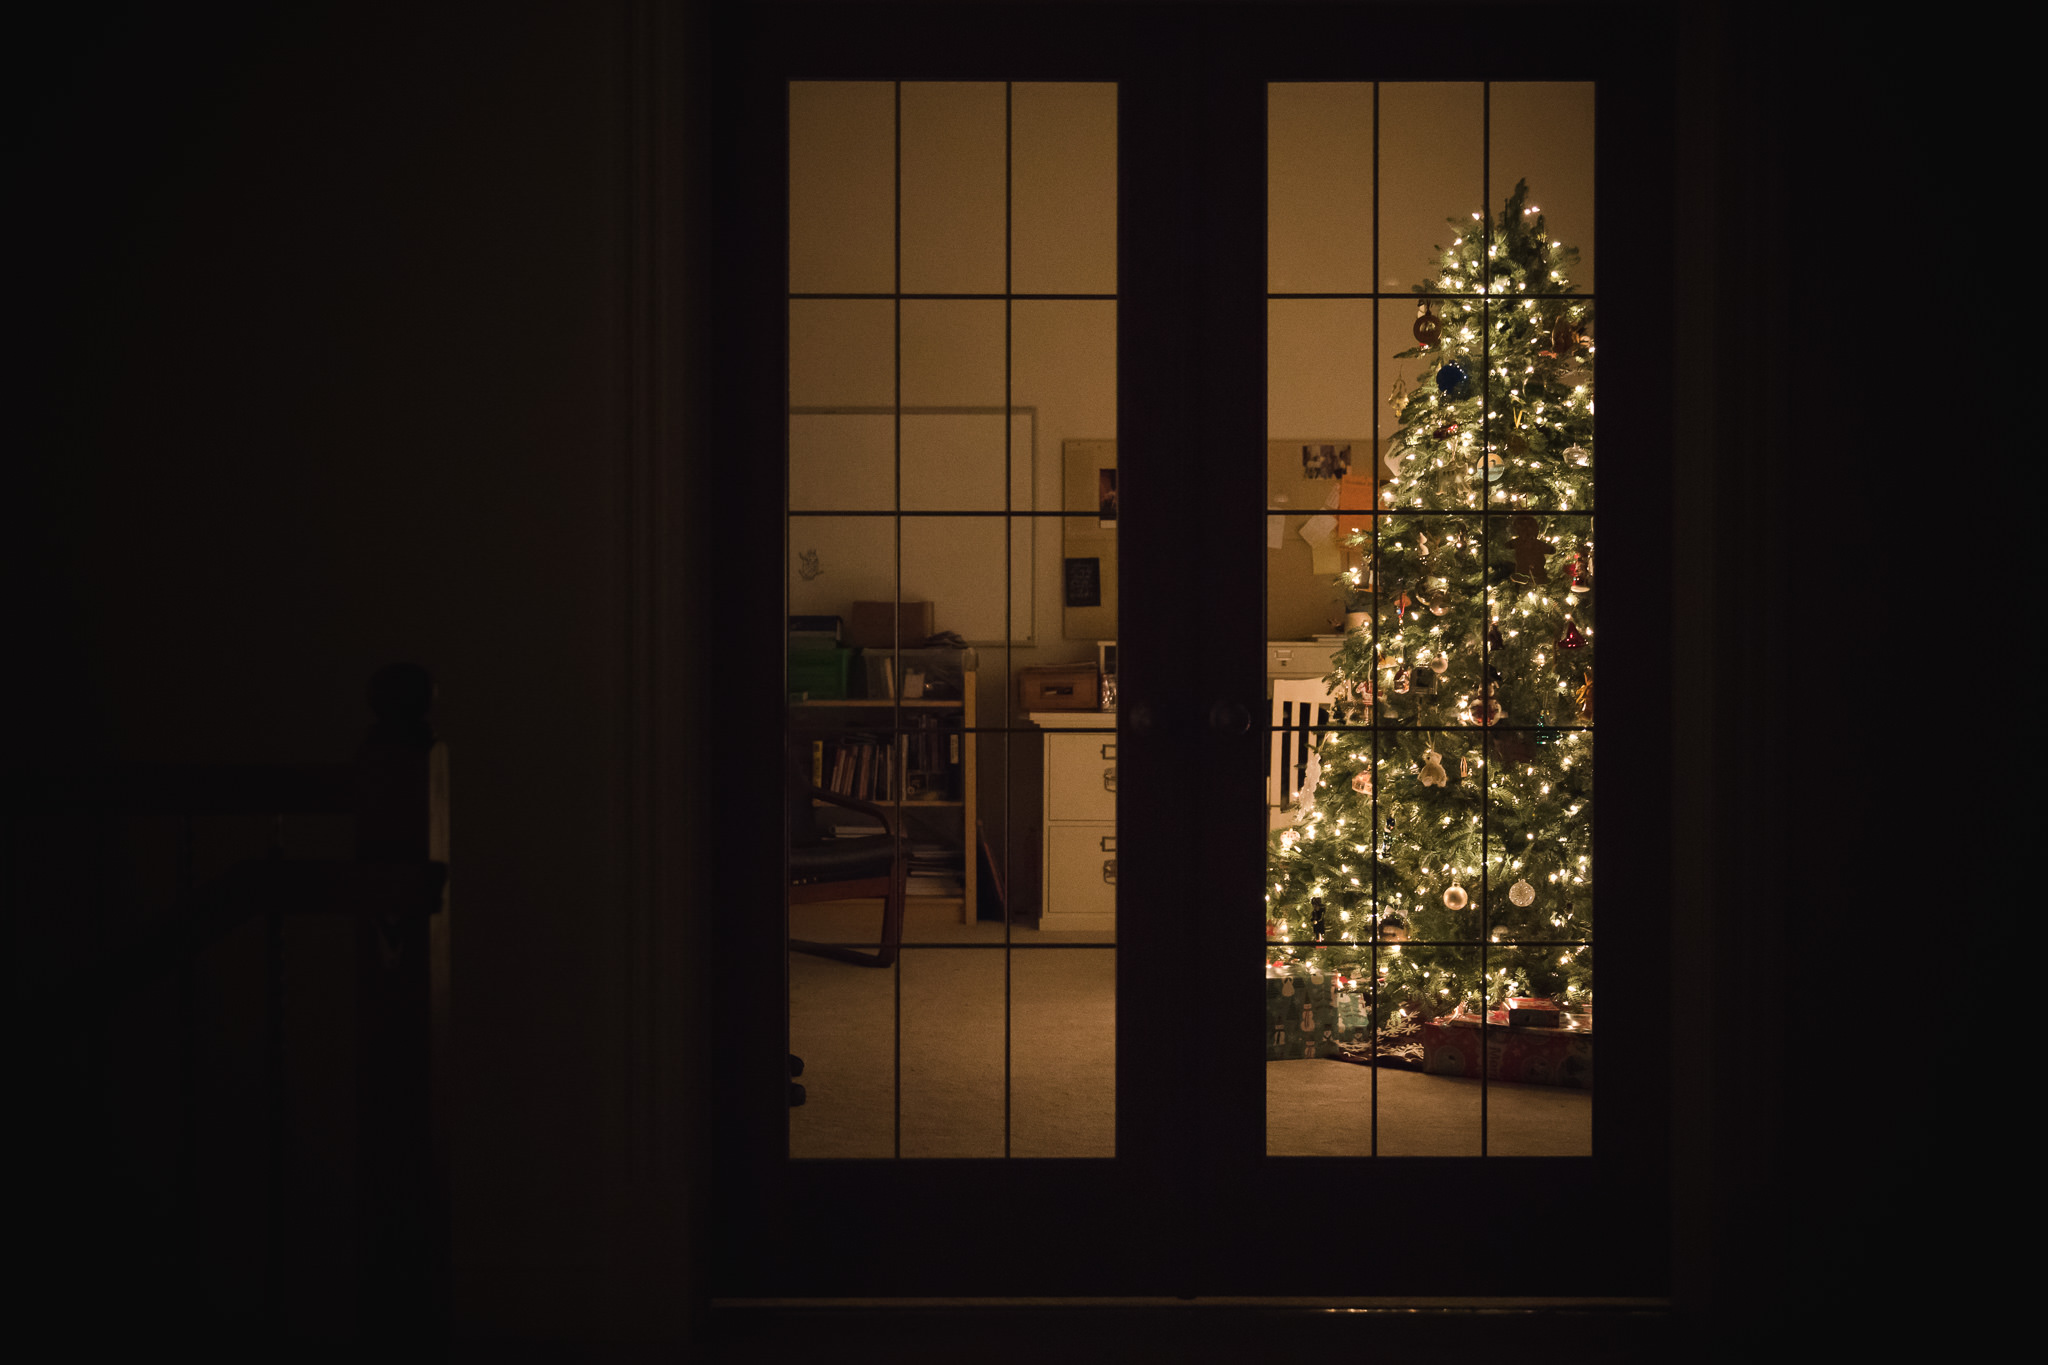 Christmas tree in den behind french doors